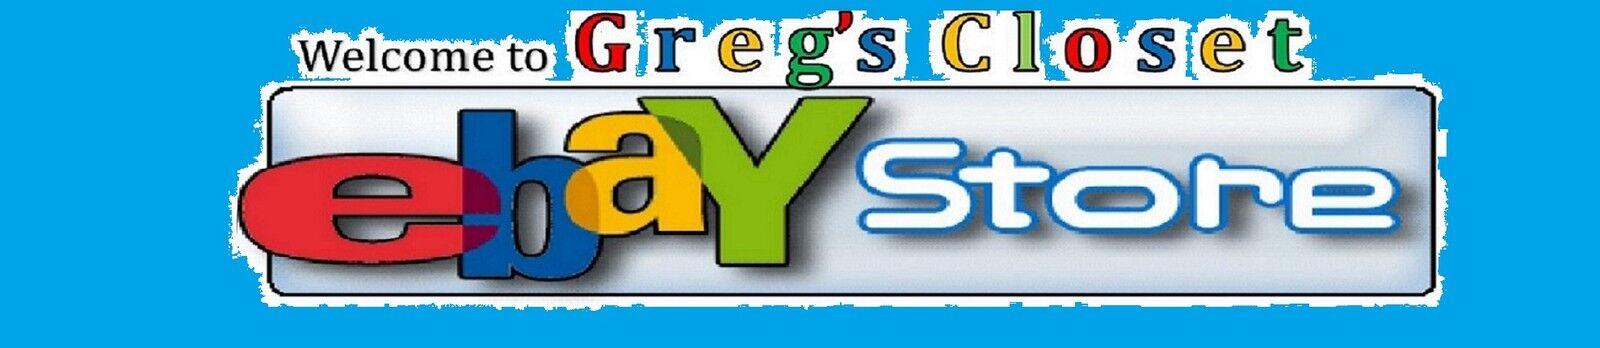 Greg's Closet